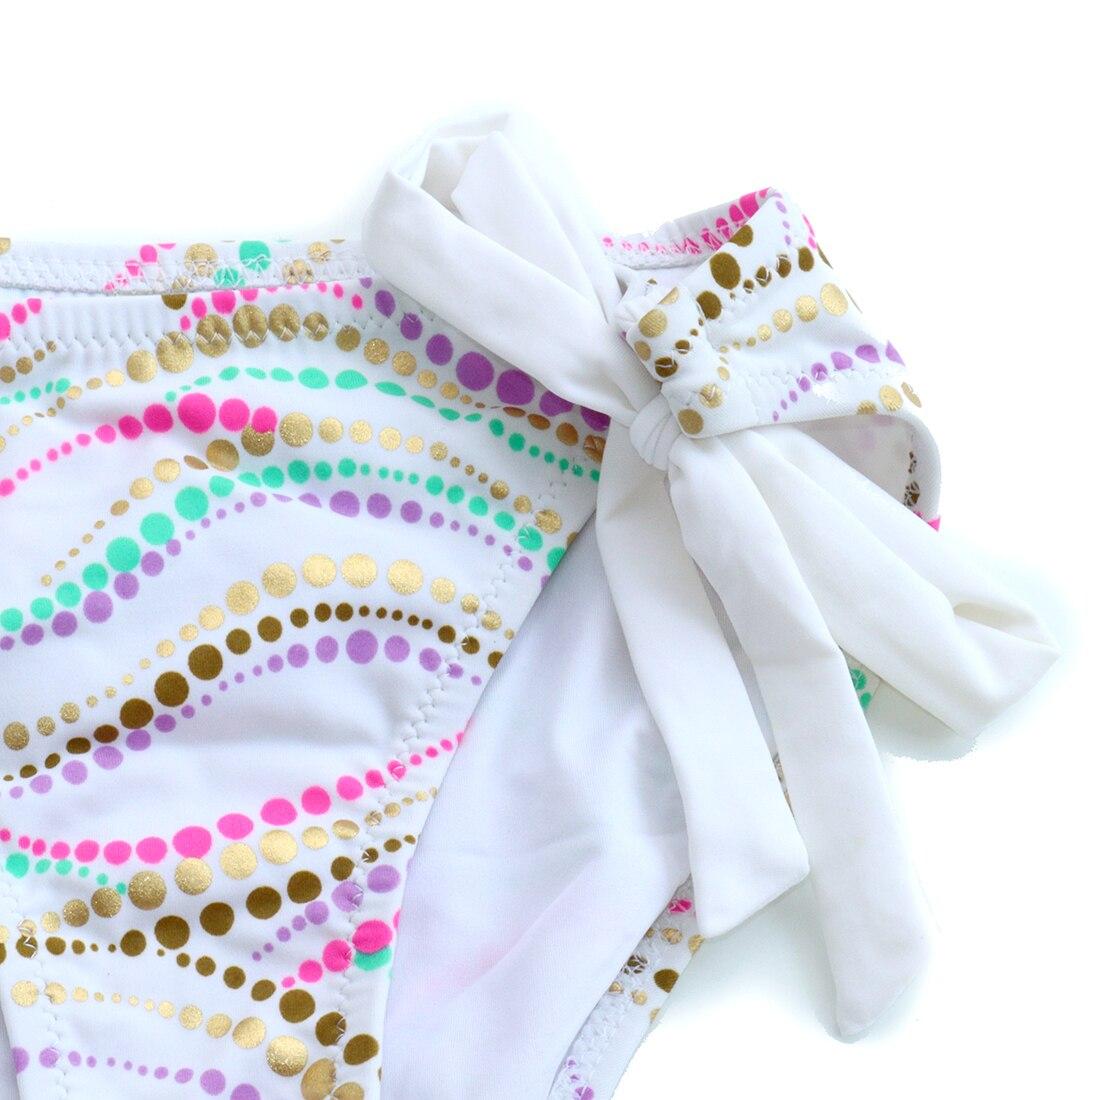 Underwier BIKINIS sets Swim Suit for Women White Bikini  Bathing suits Swimwear Swimming Wave Point Sexy Secret biqini 4